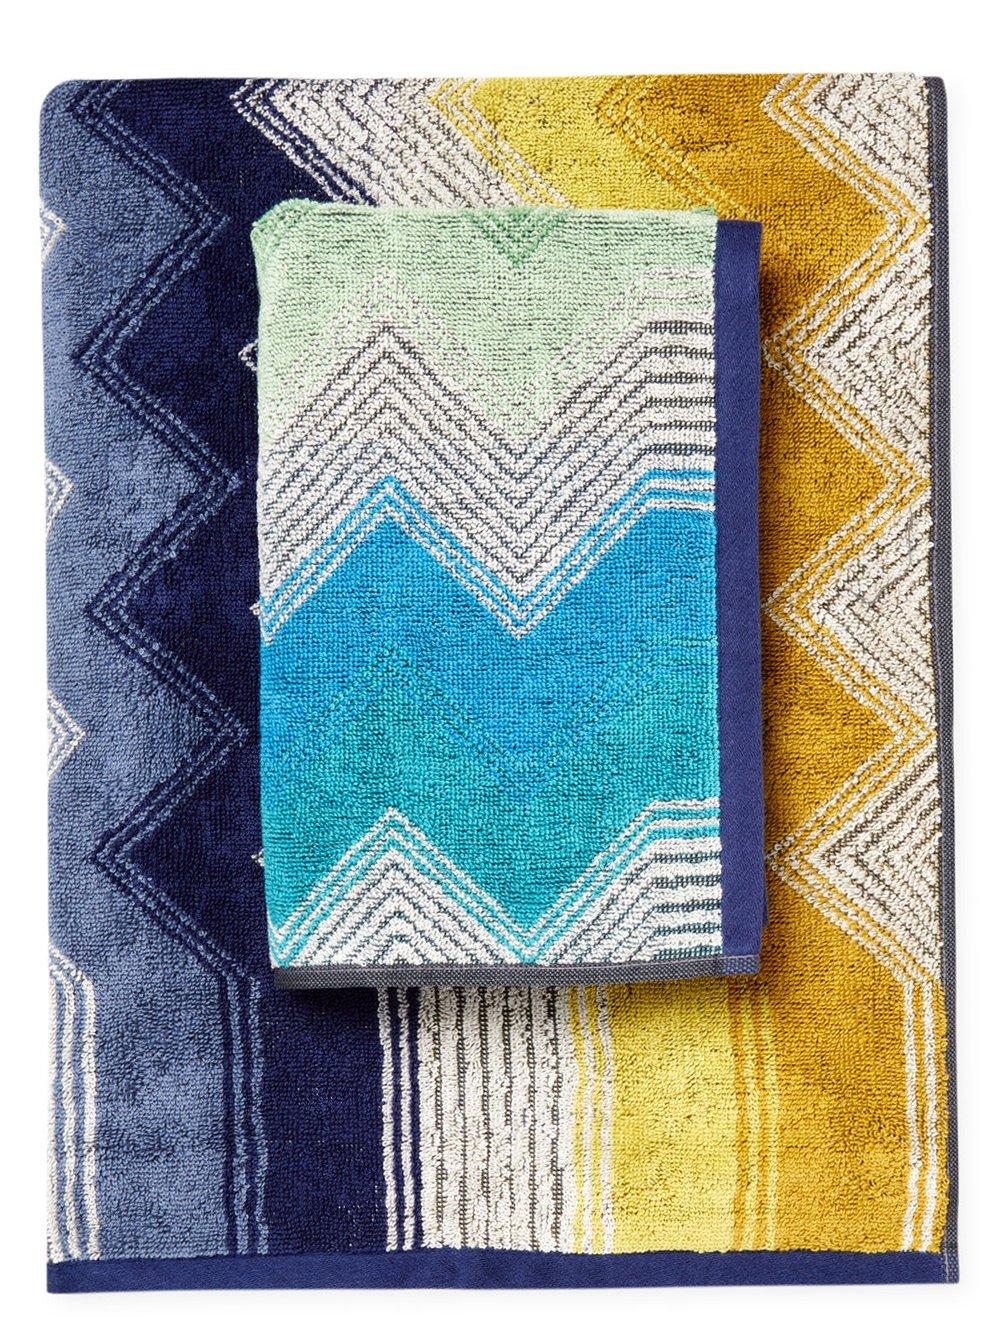 Missoni Home Selma - Juego de toallas (2 unidades) toalla de baño + toalla de mano: Amazon.es: Hogar